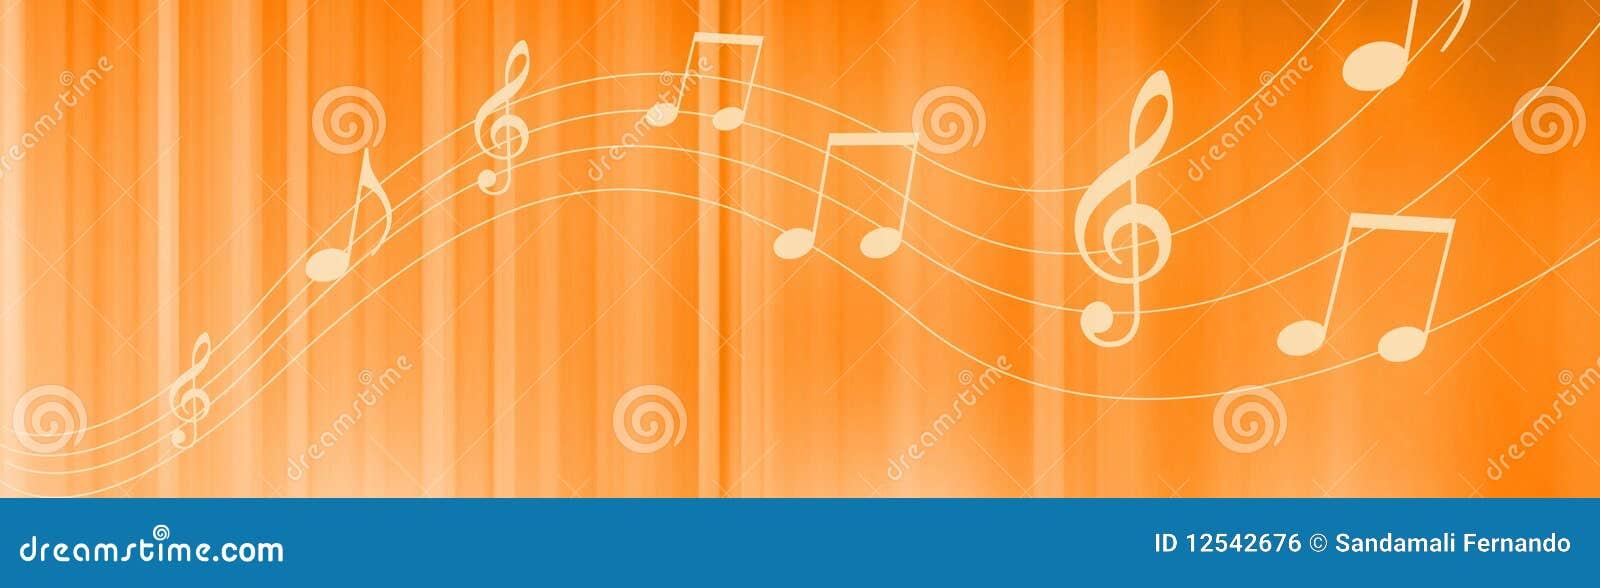 Music Notes Header Royalty Free Stock Image